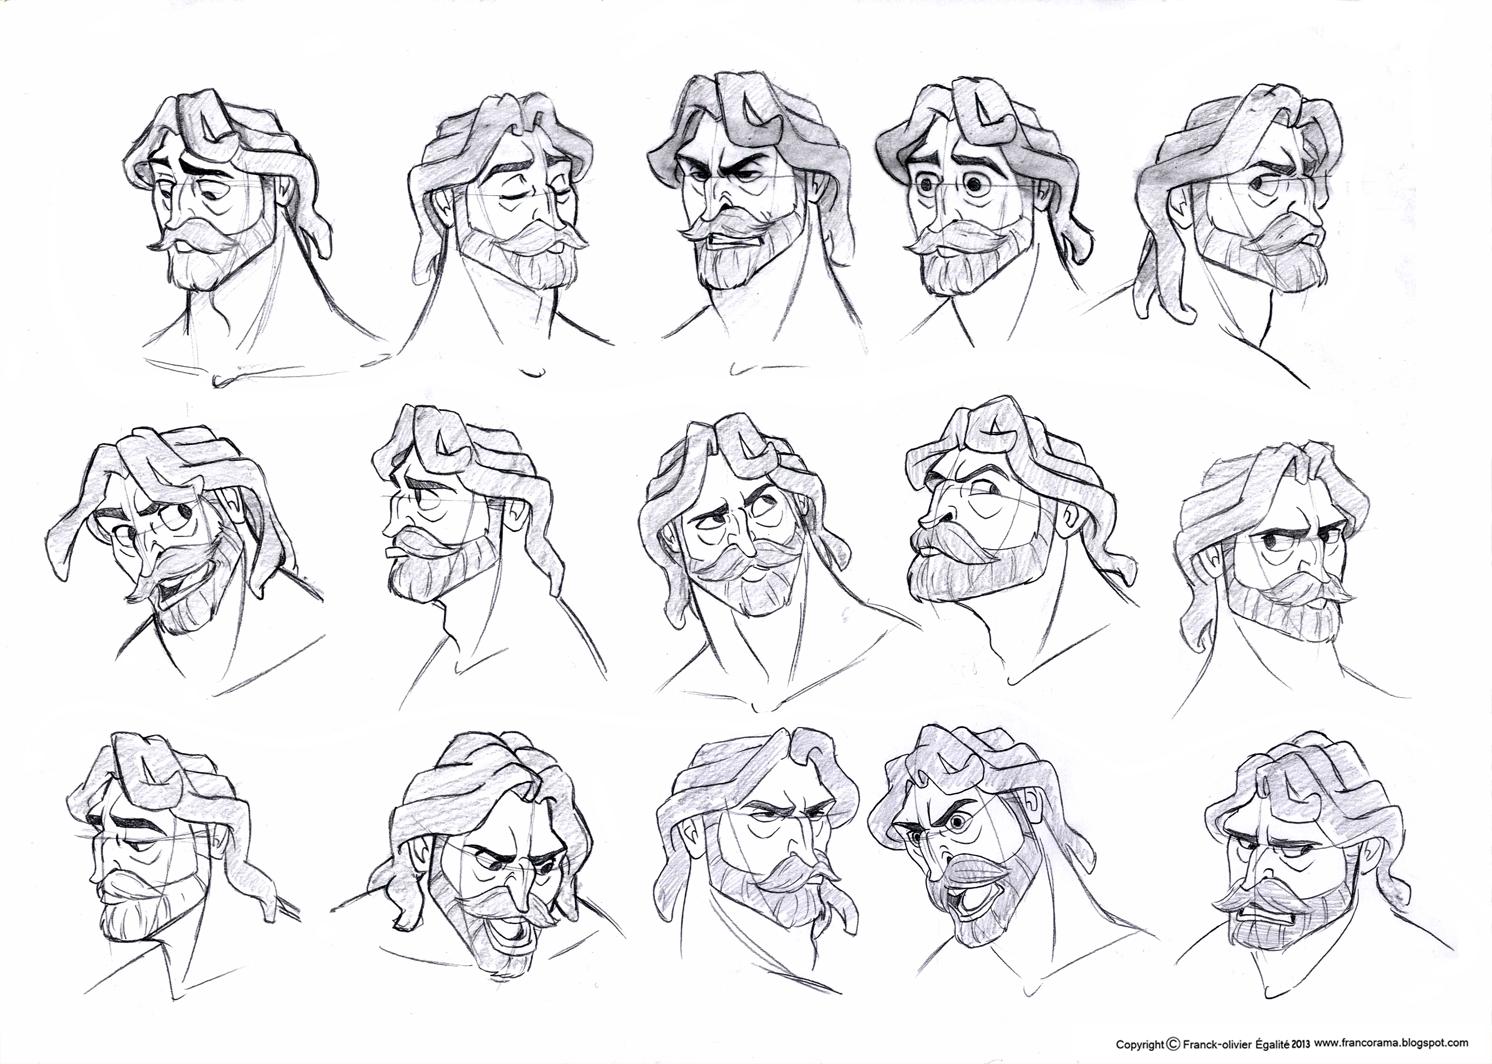 Disney Character Design Tarzan : Franco s character design assignment tree tarzan